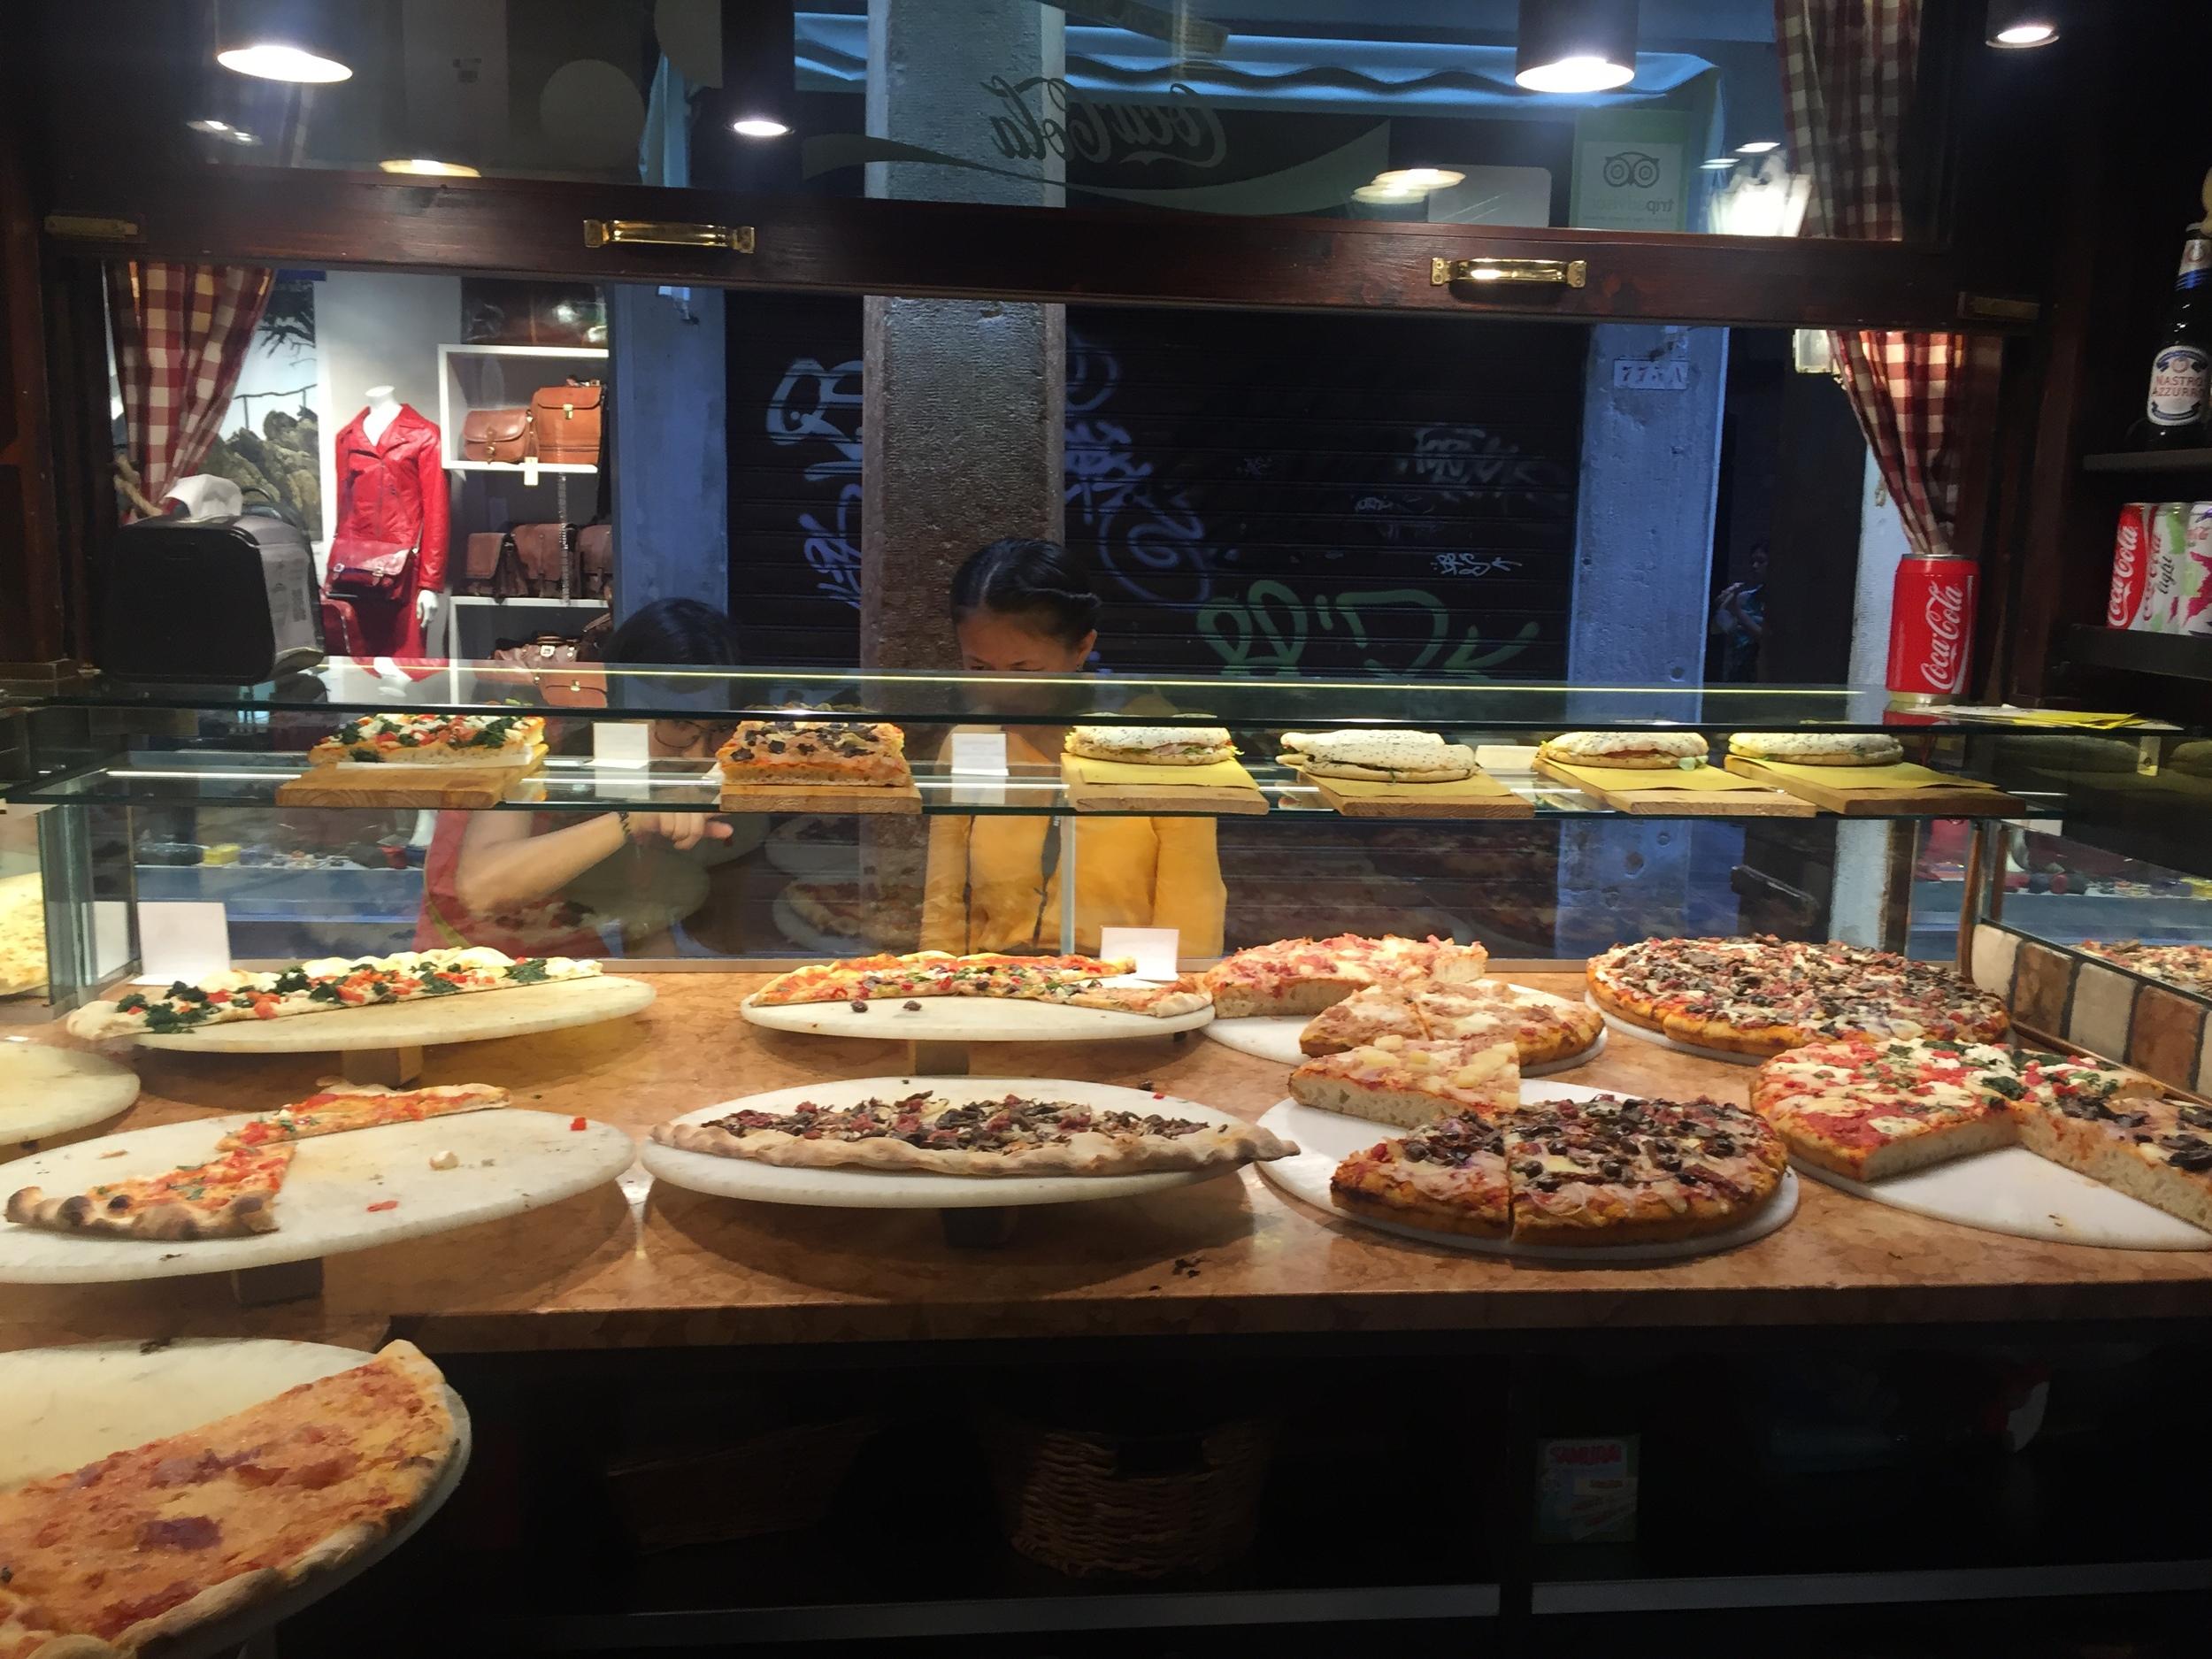 Pizza to go - Venice Travel Guide